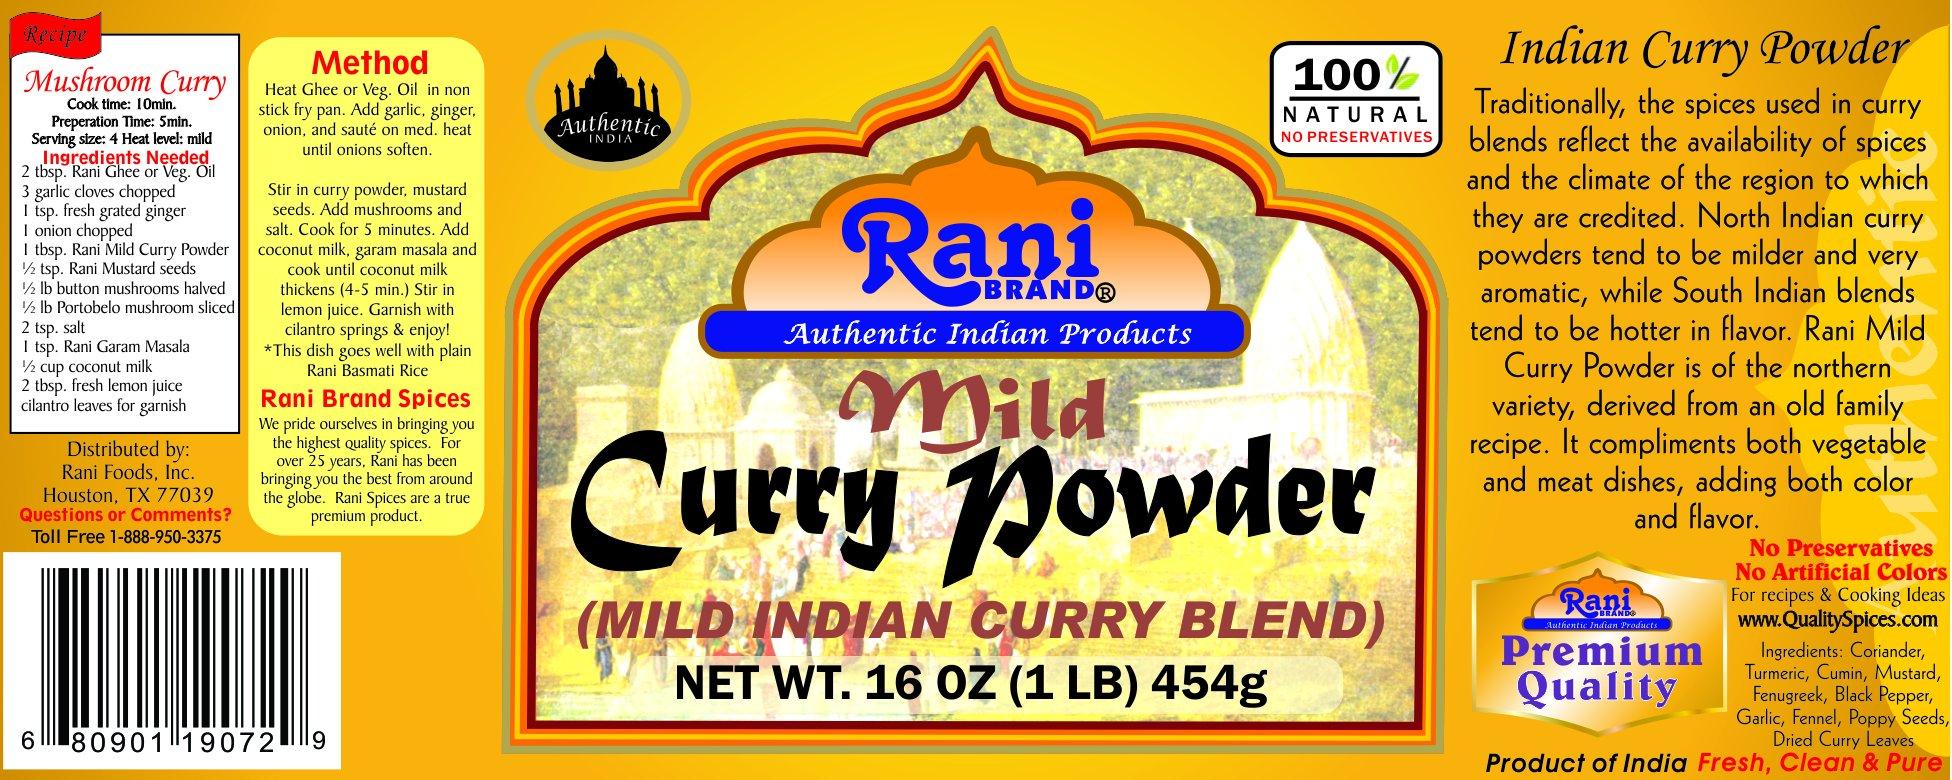 Rani Curry Powder Mild Natural 10-Spice Blend 1lb (16oz) ~ Salt Free | Vegan | Gluten Free Ingredients | NON-GMO